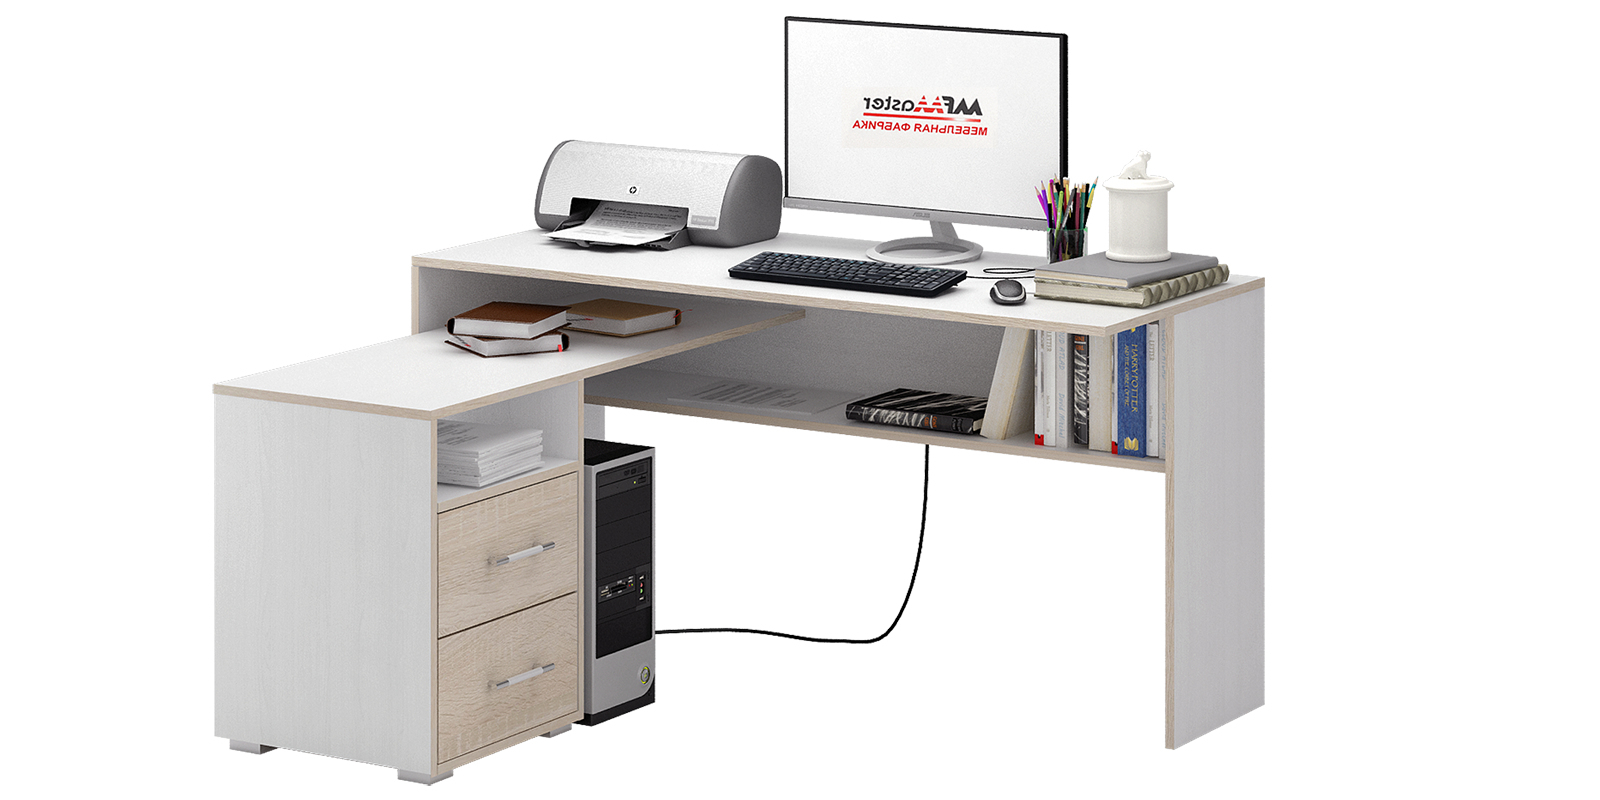 Стол компьютерный HomeMe Старк стол компьютерный milan